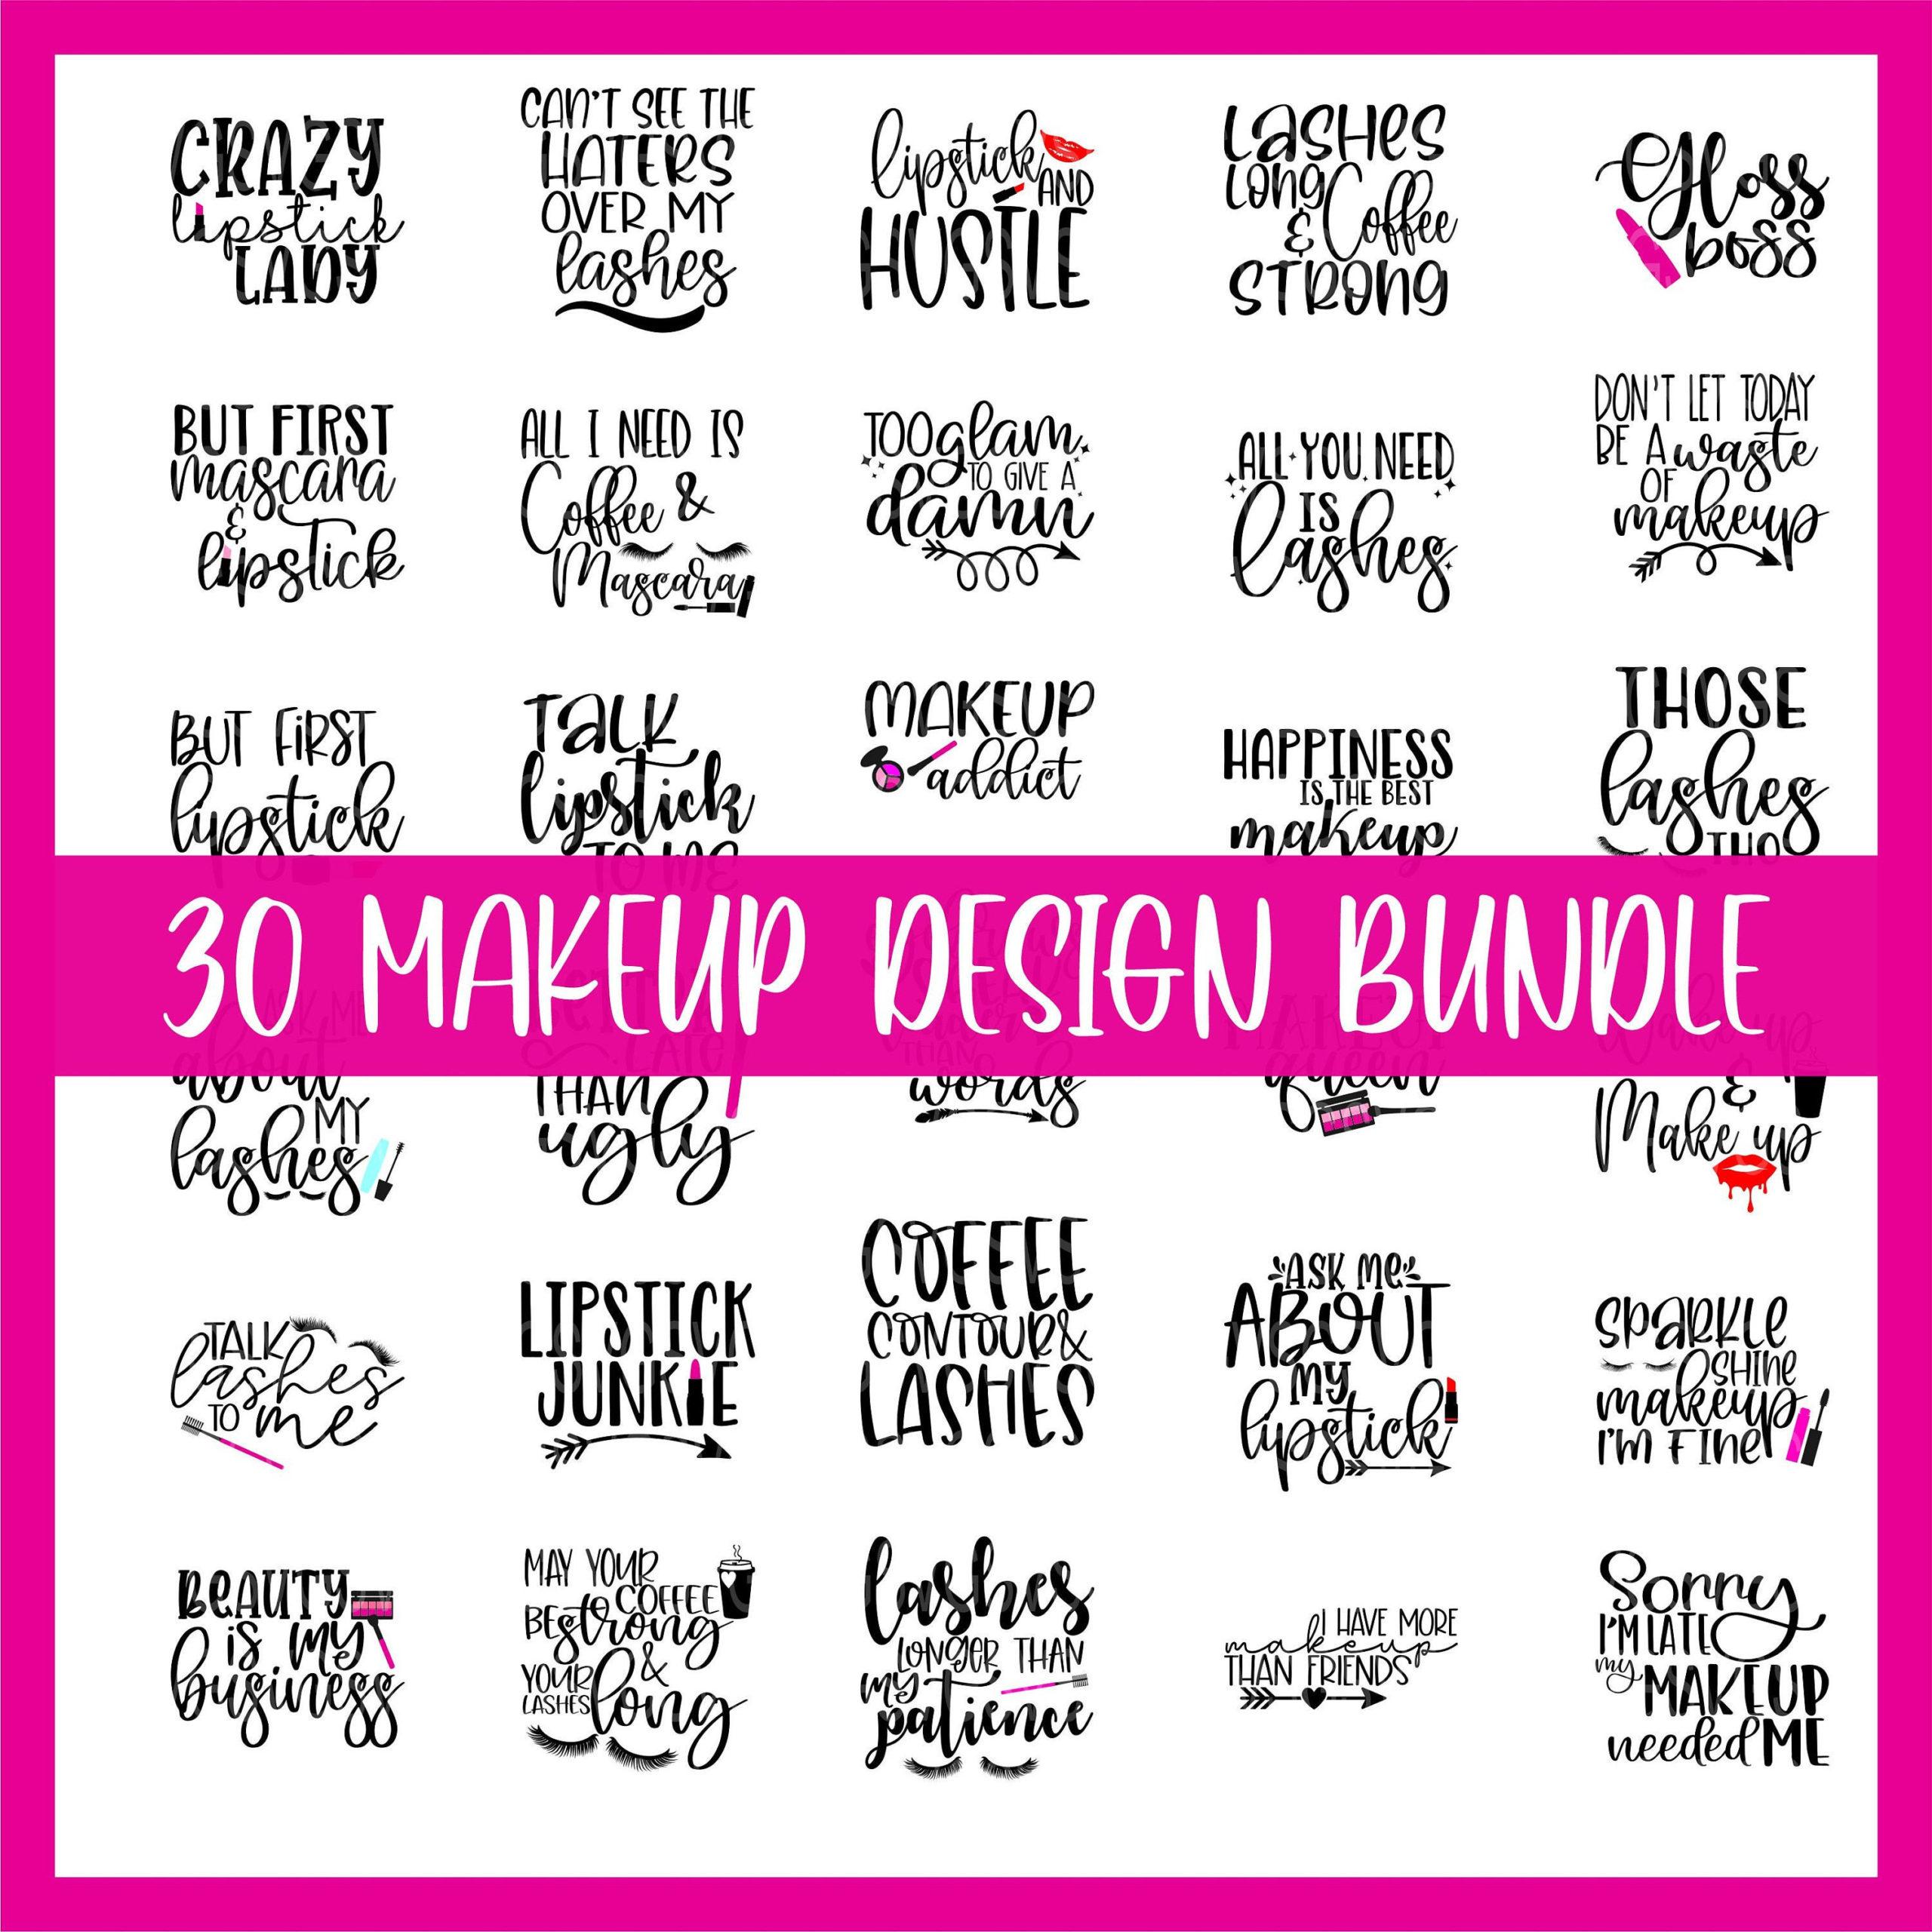 30-makeup-design-bundle-svg-bundle-svg-makeup-bundle-svg-make-up-bundle-svg-makeup-svg-designs-makeup-cut-files-cricut-svg-600a10c2